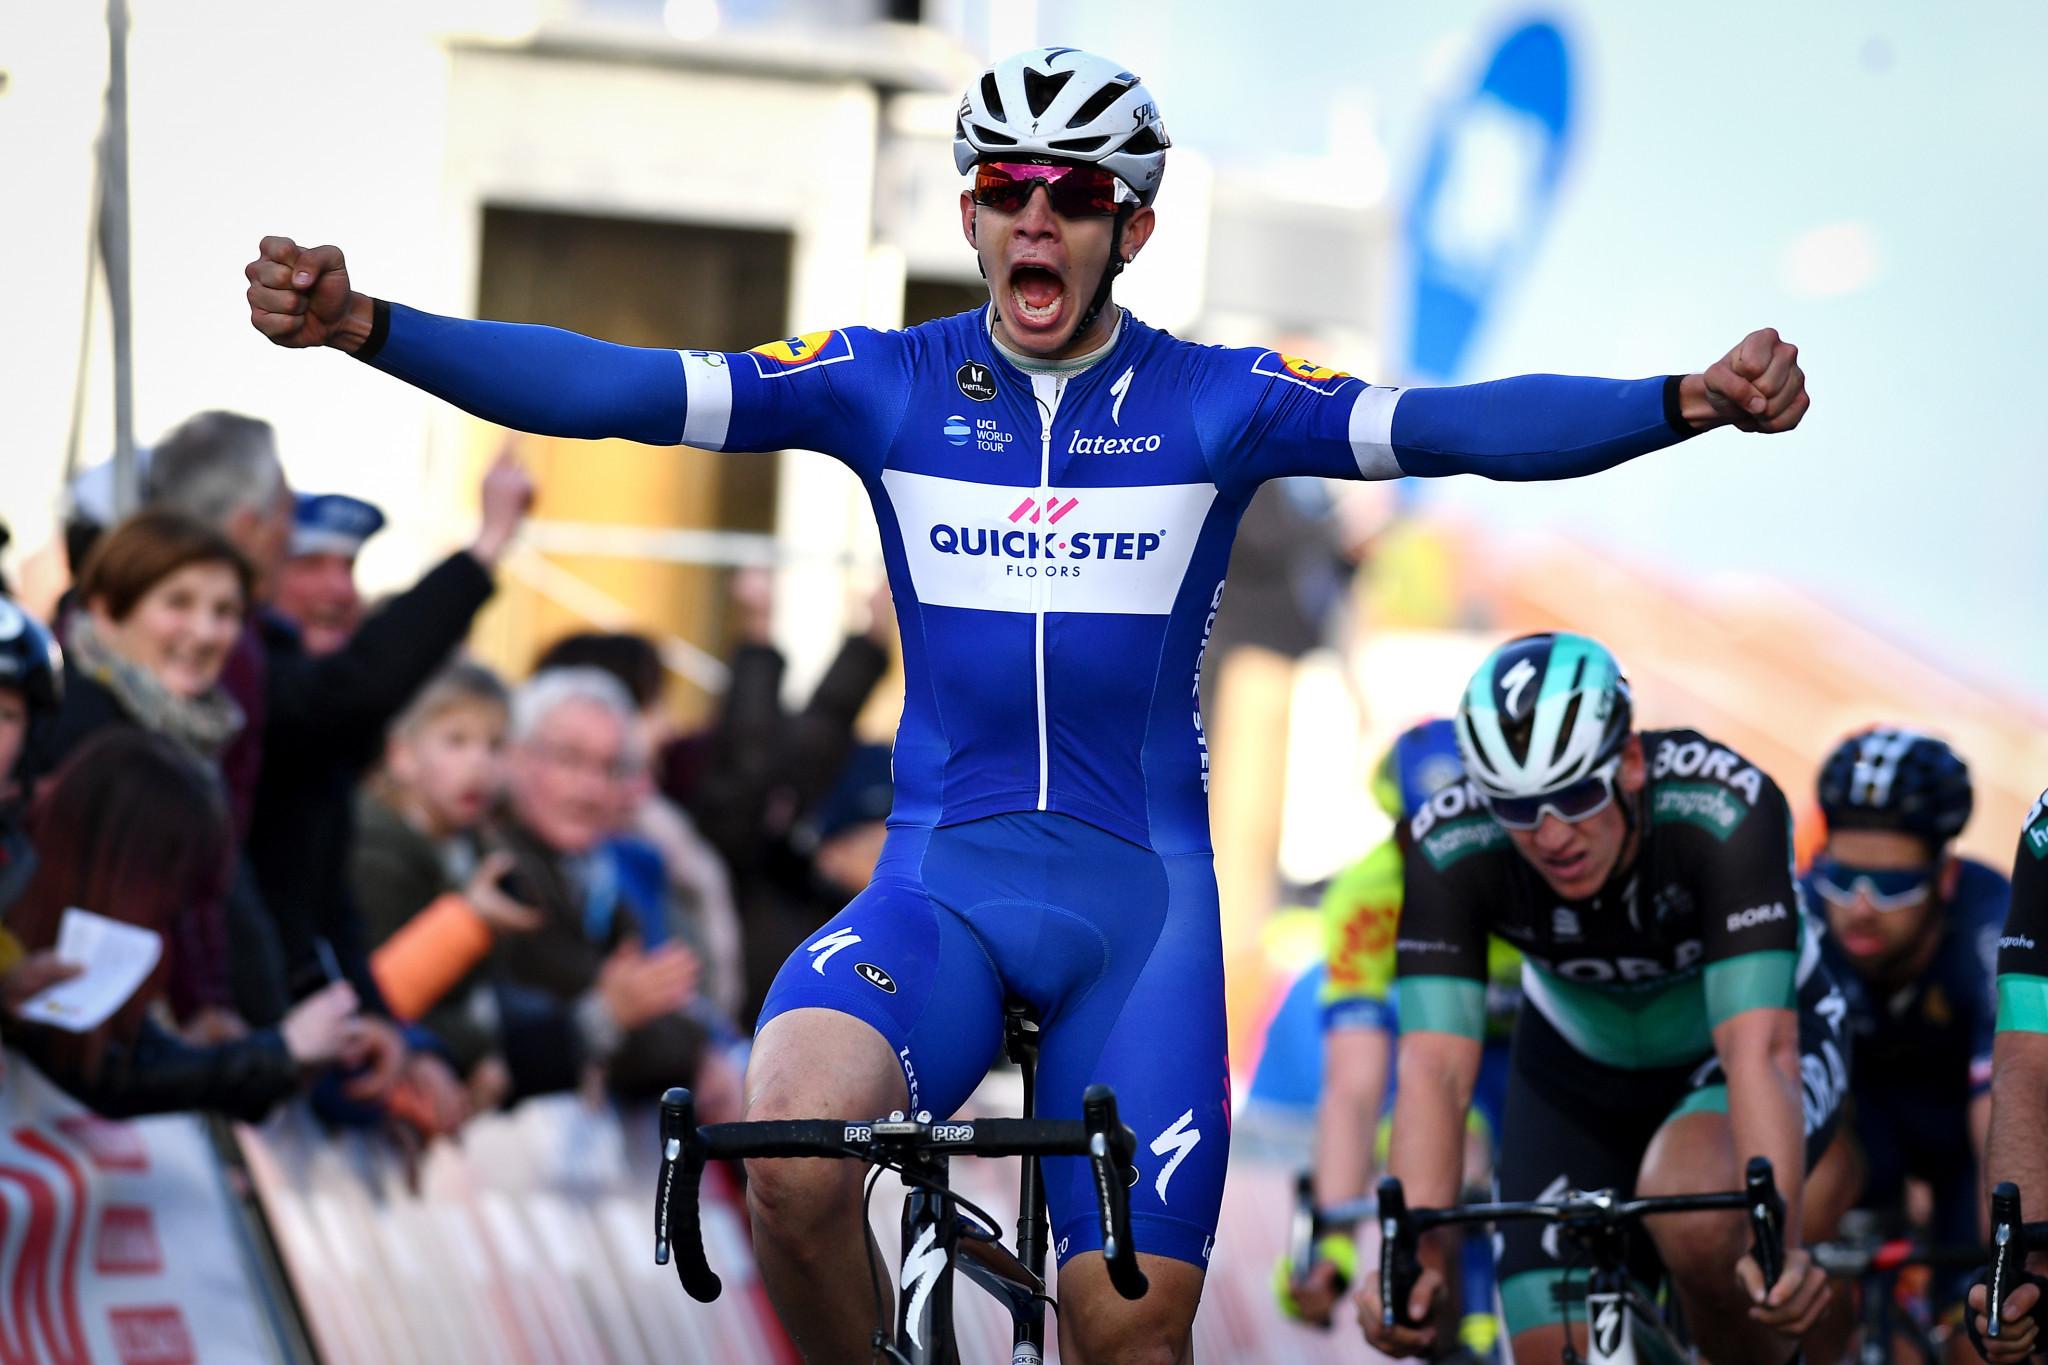 Catalunya: Quick-Step's Hodeg wins stage 1 handily